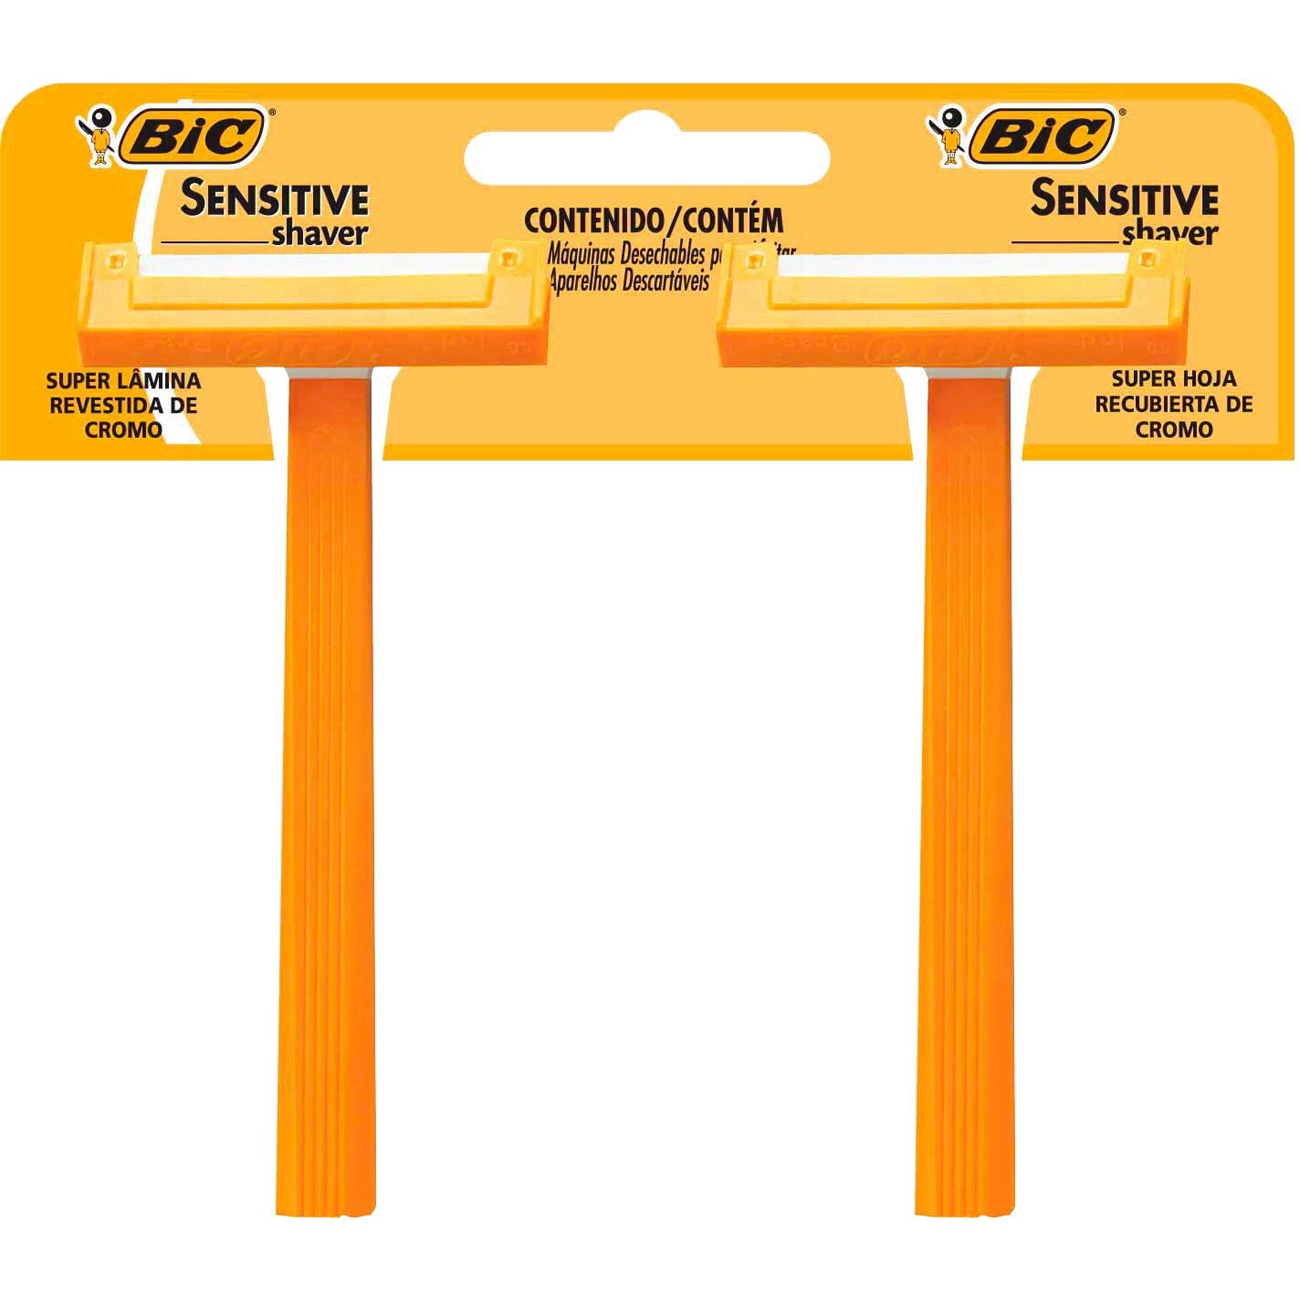 Aparador Bic Sensitive 2Un Shaver